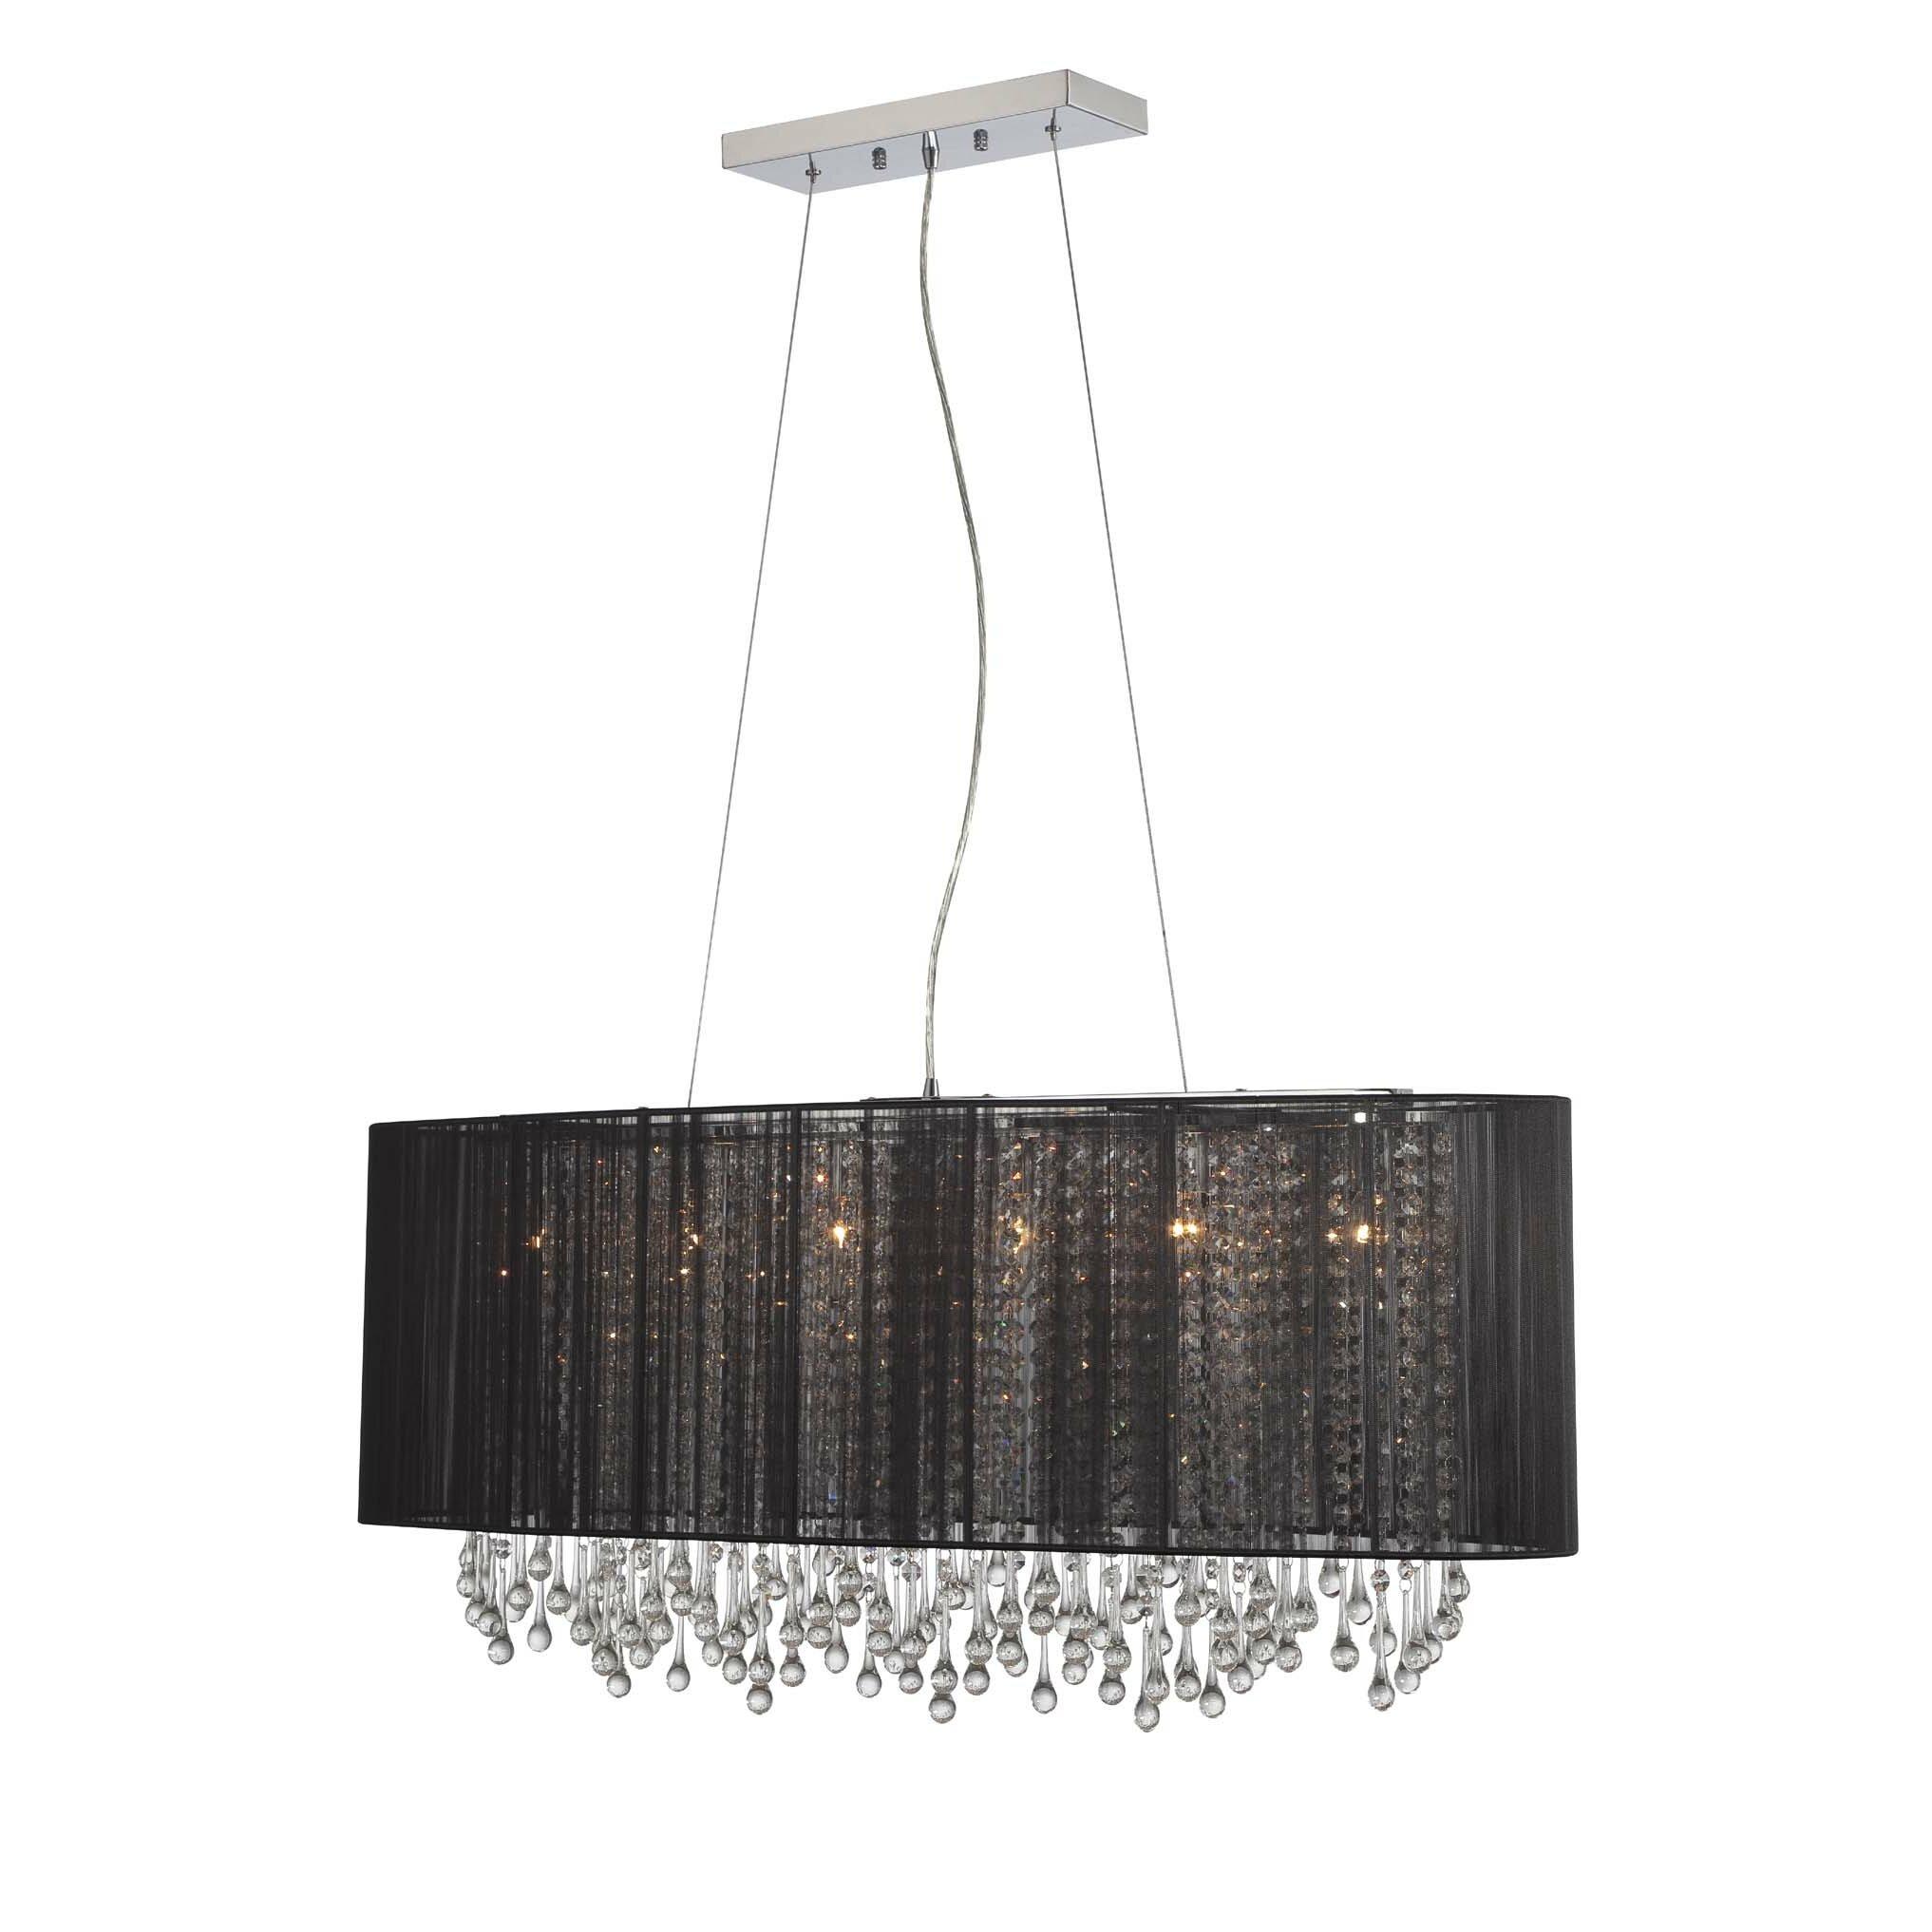 Avenue lighting beverly drive 6 light crystal chandelier for 6 light crystal chandelier